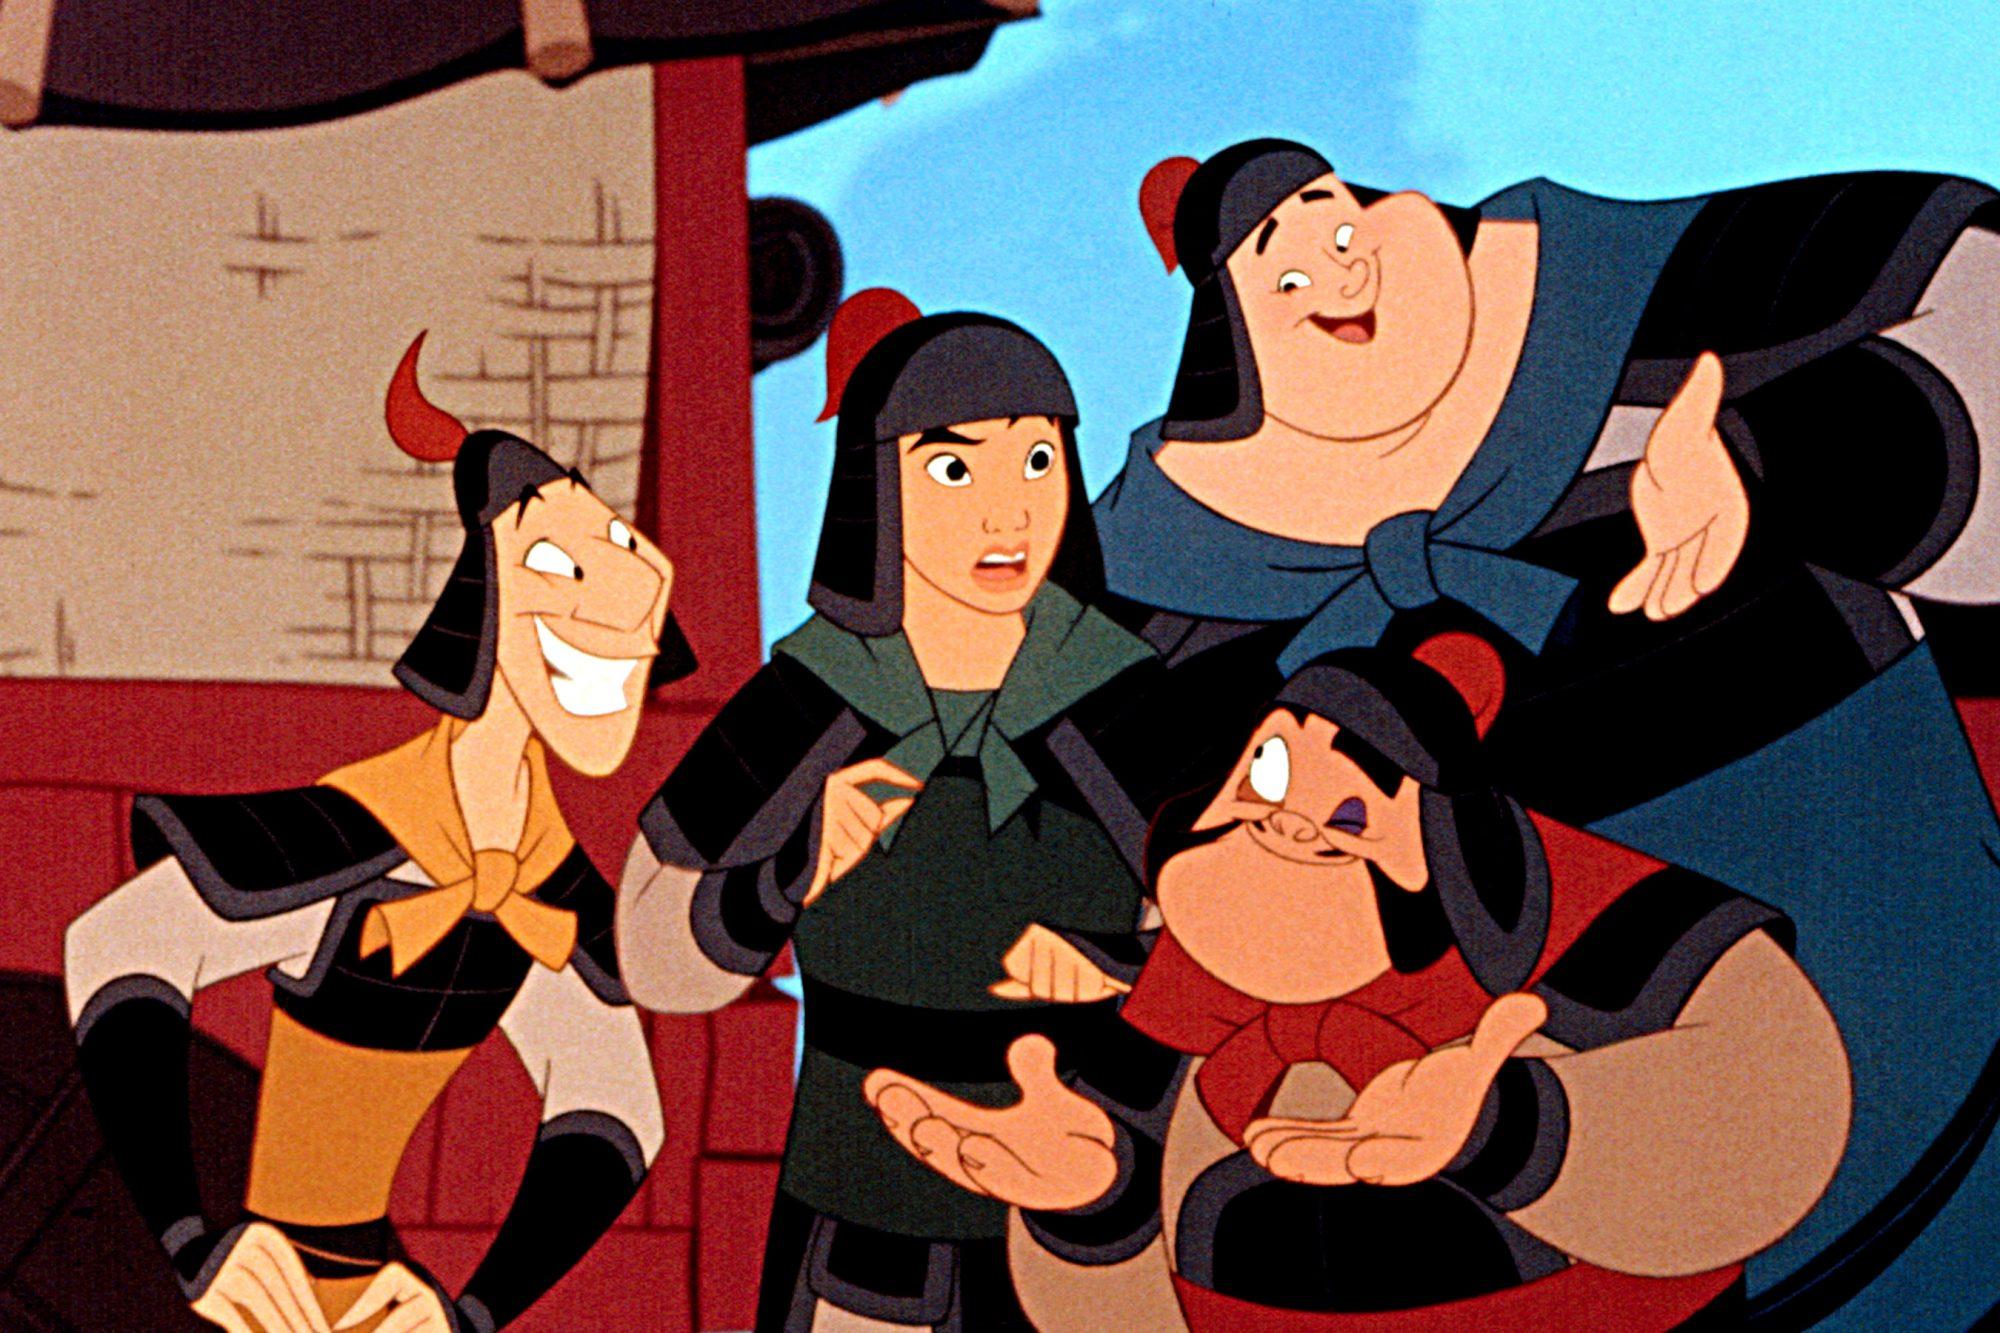 MULAN, Mulan (center), 1998. c) Walt Disney Pictures/ Courtesy: Everett Collection.